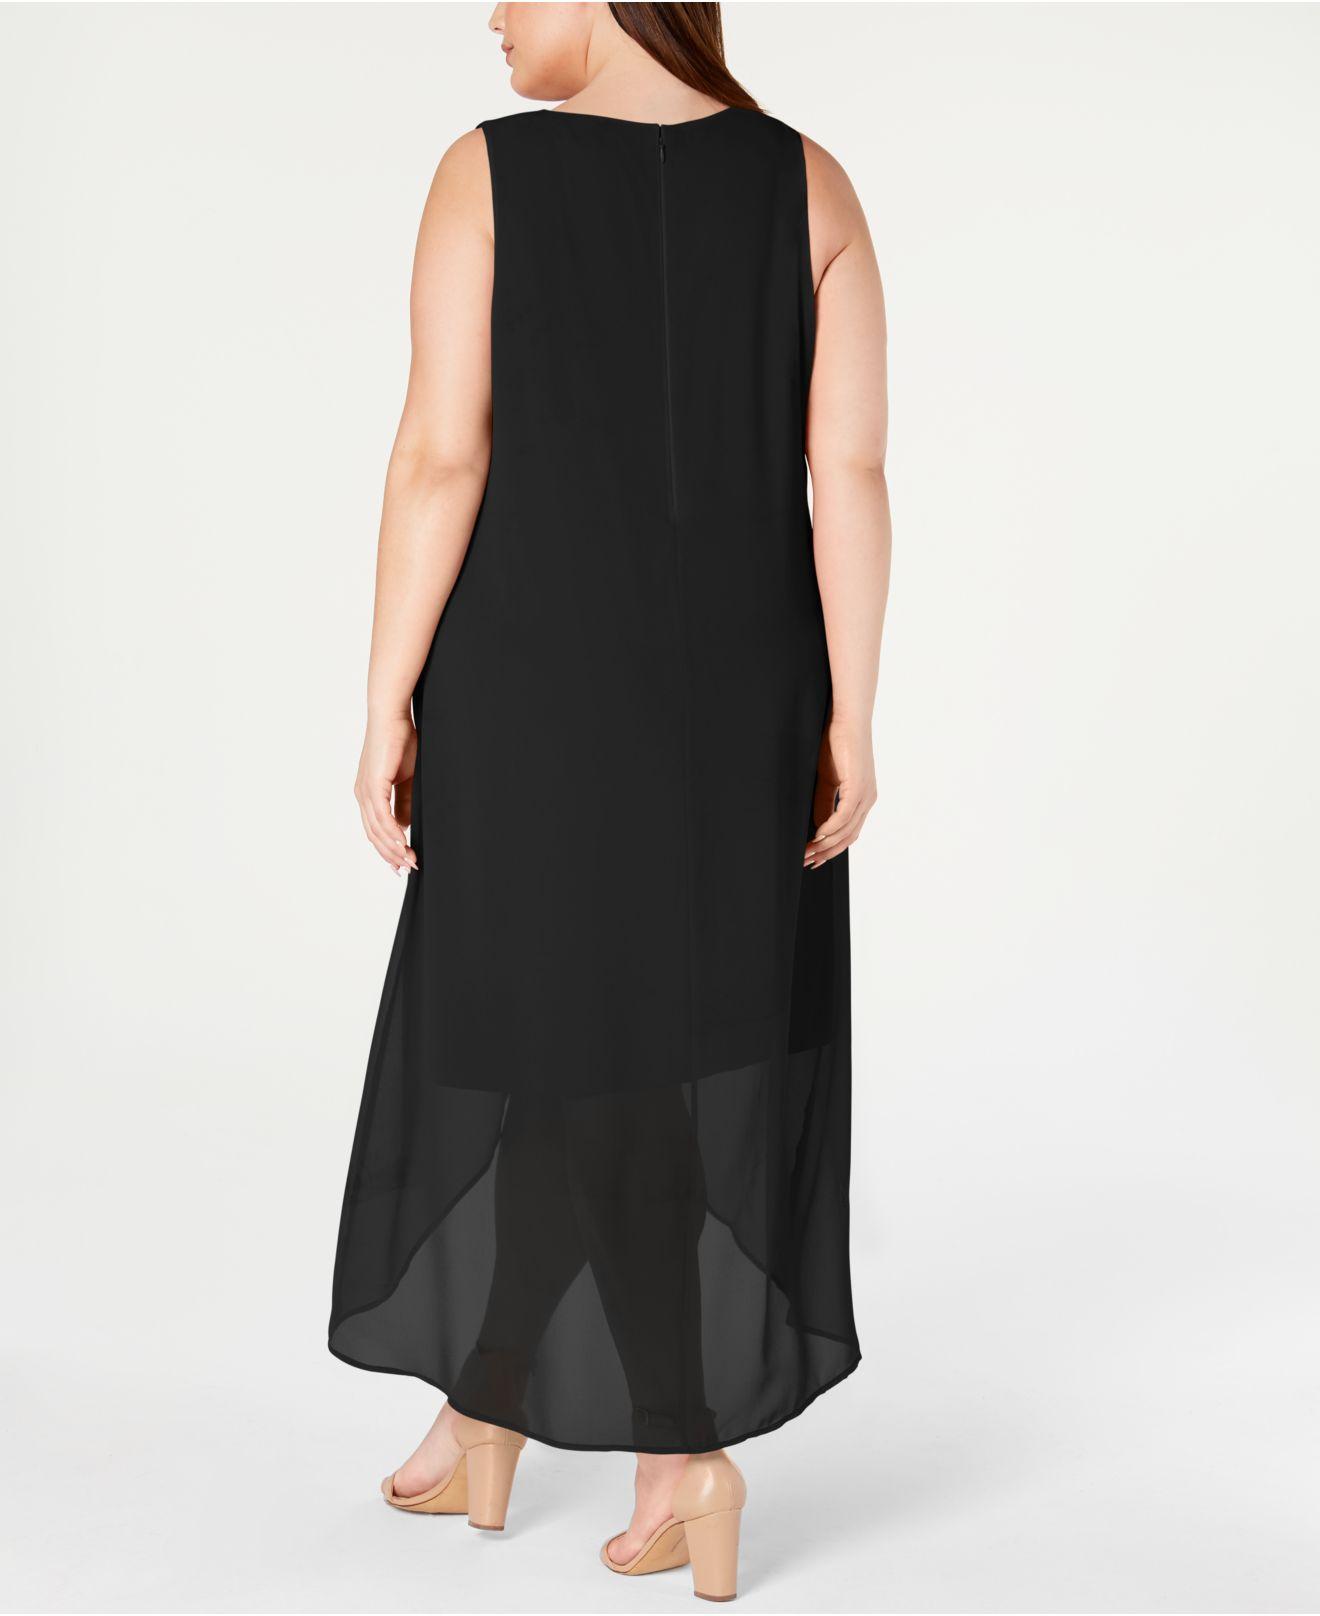 Black Dress Plus Size Macys   Saddha